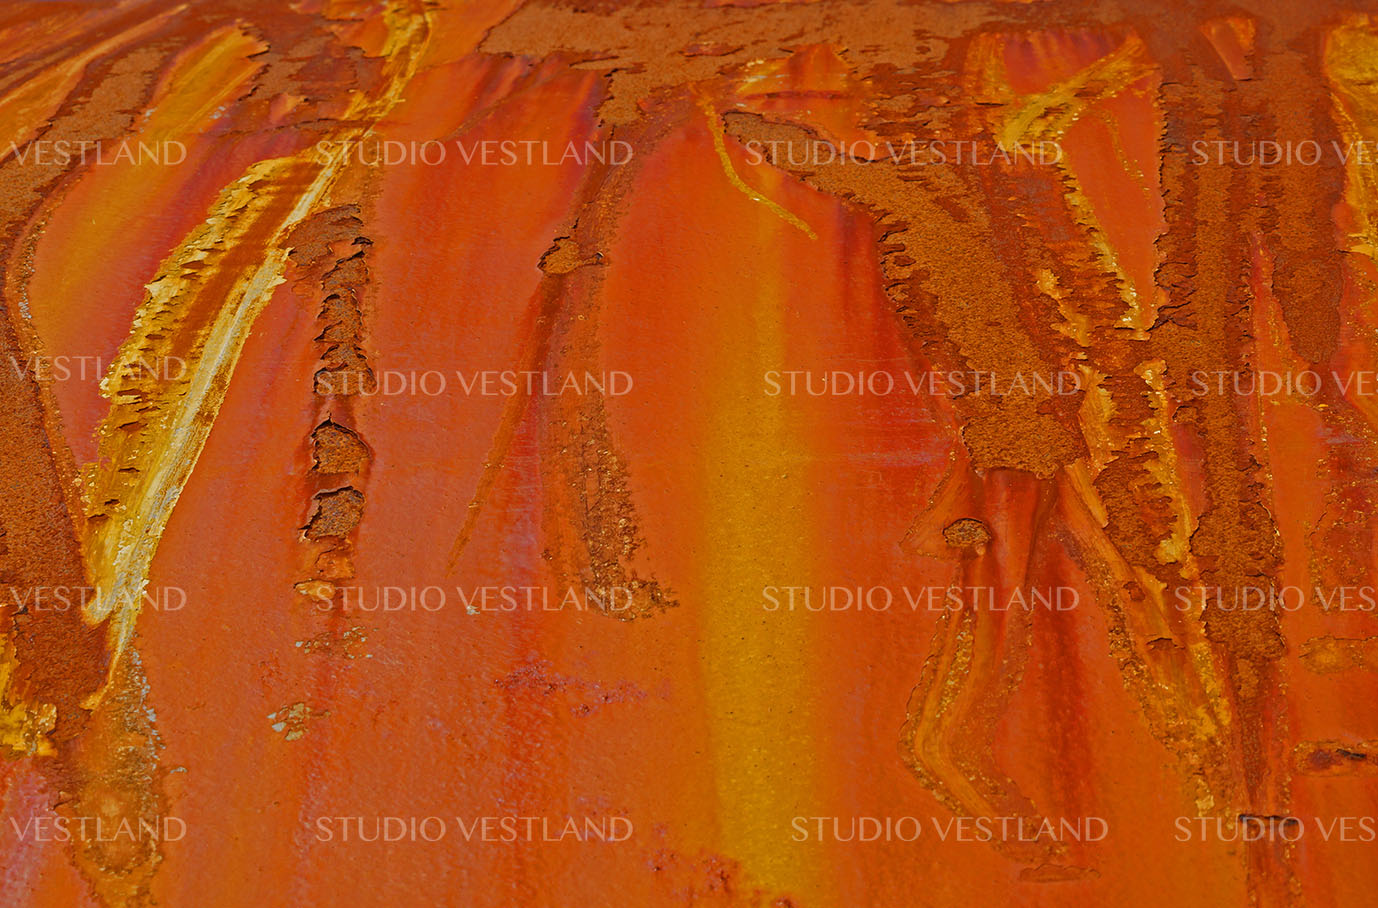 Studio Vestland - Trommelkunst 10